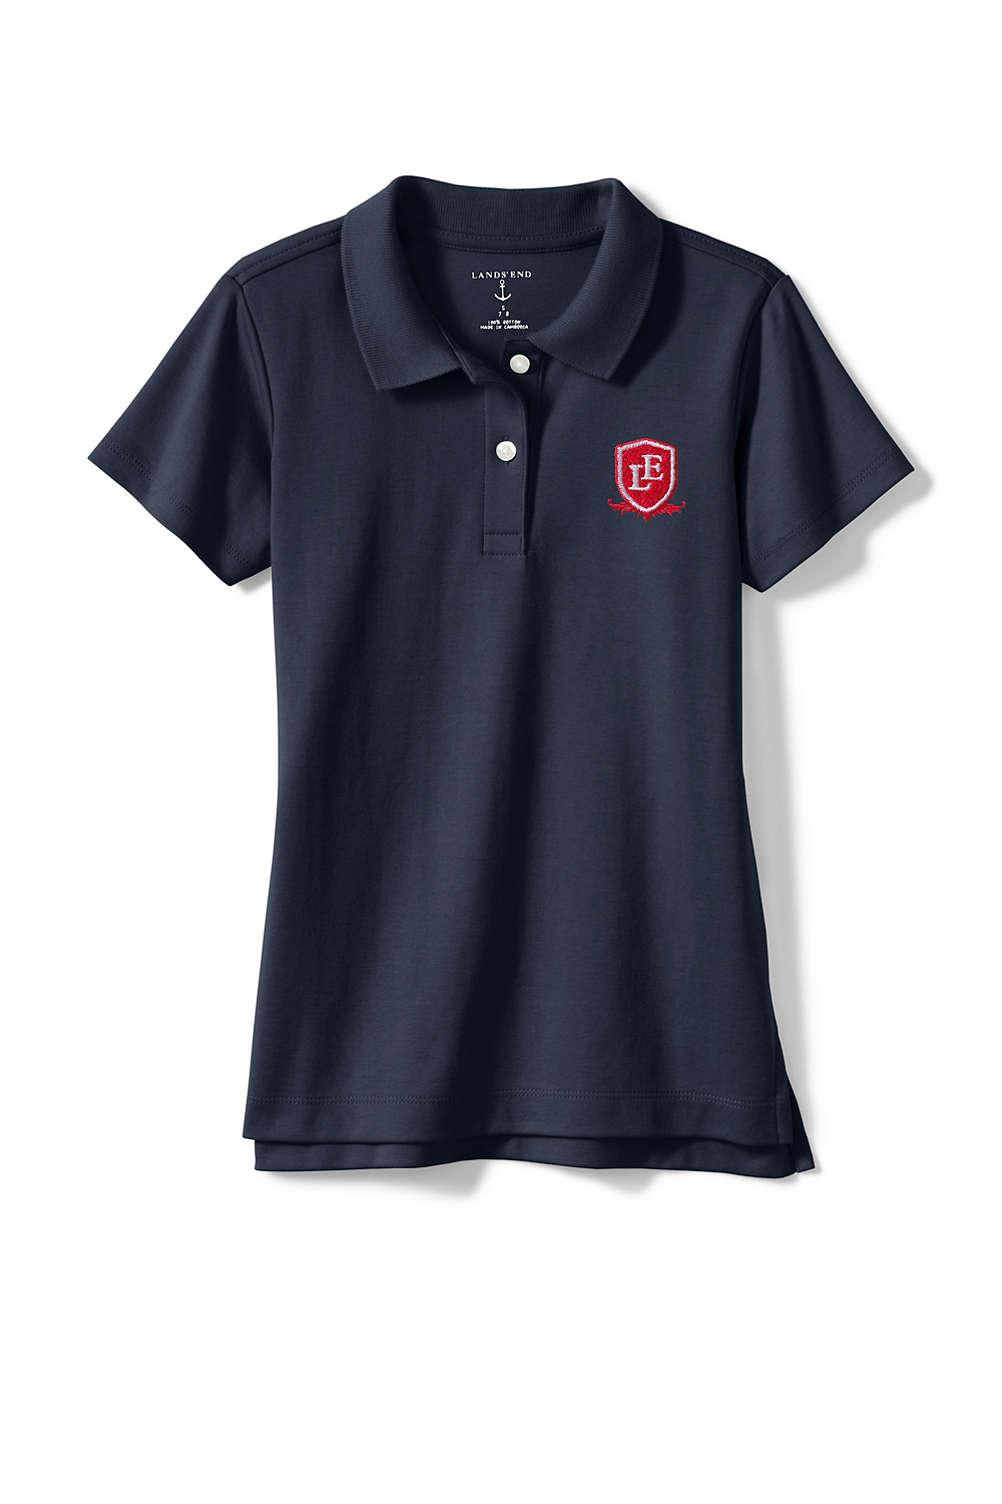 5e7a14df462 School Uniform Logo Girls Short Sleeve Fem Fit Interlock Polo from ...